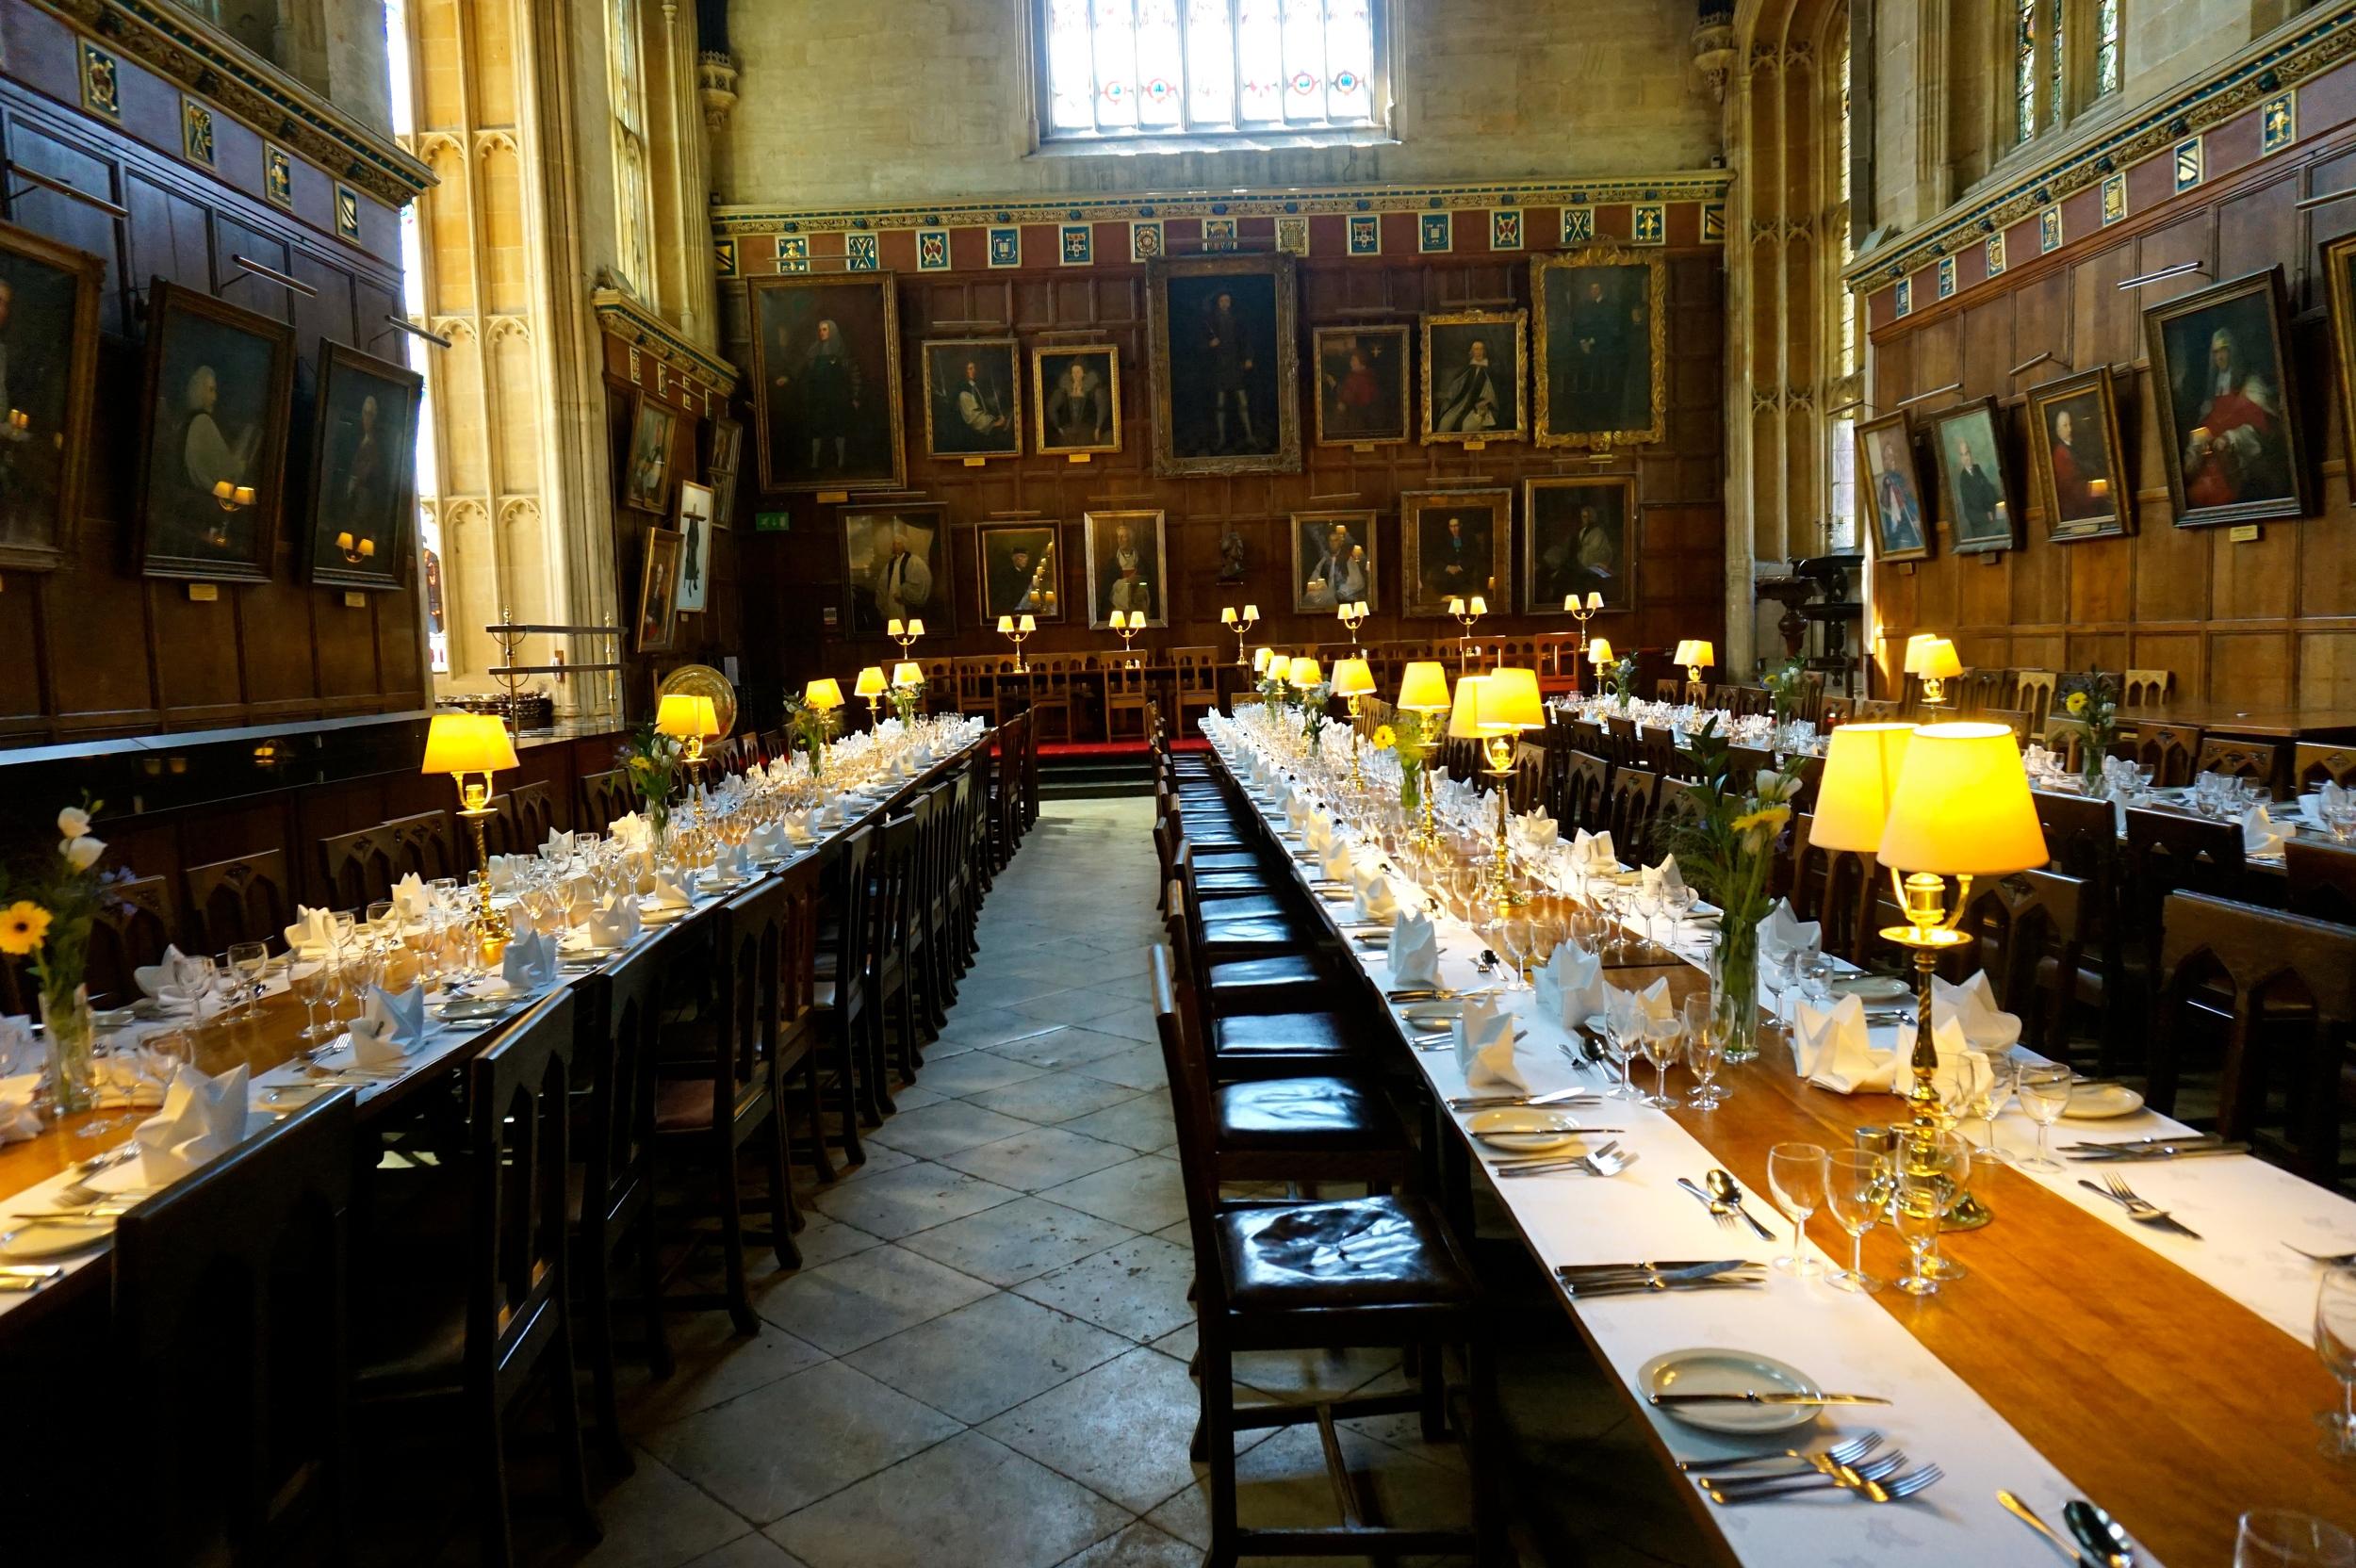 Oxfordgreathall.jpg